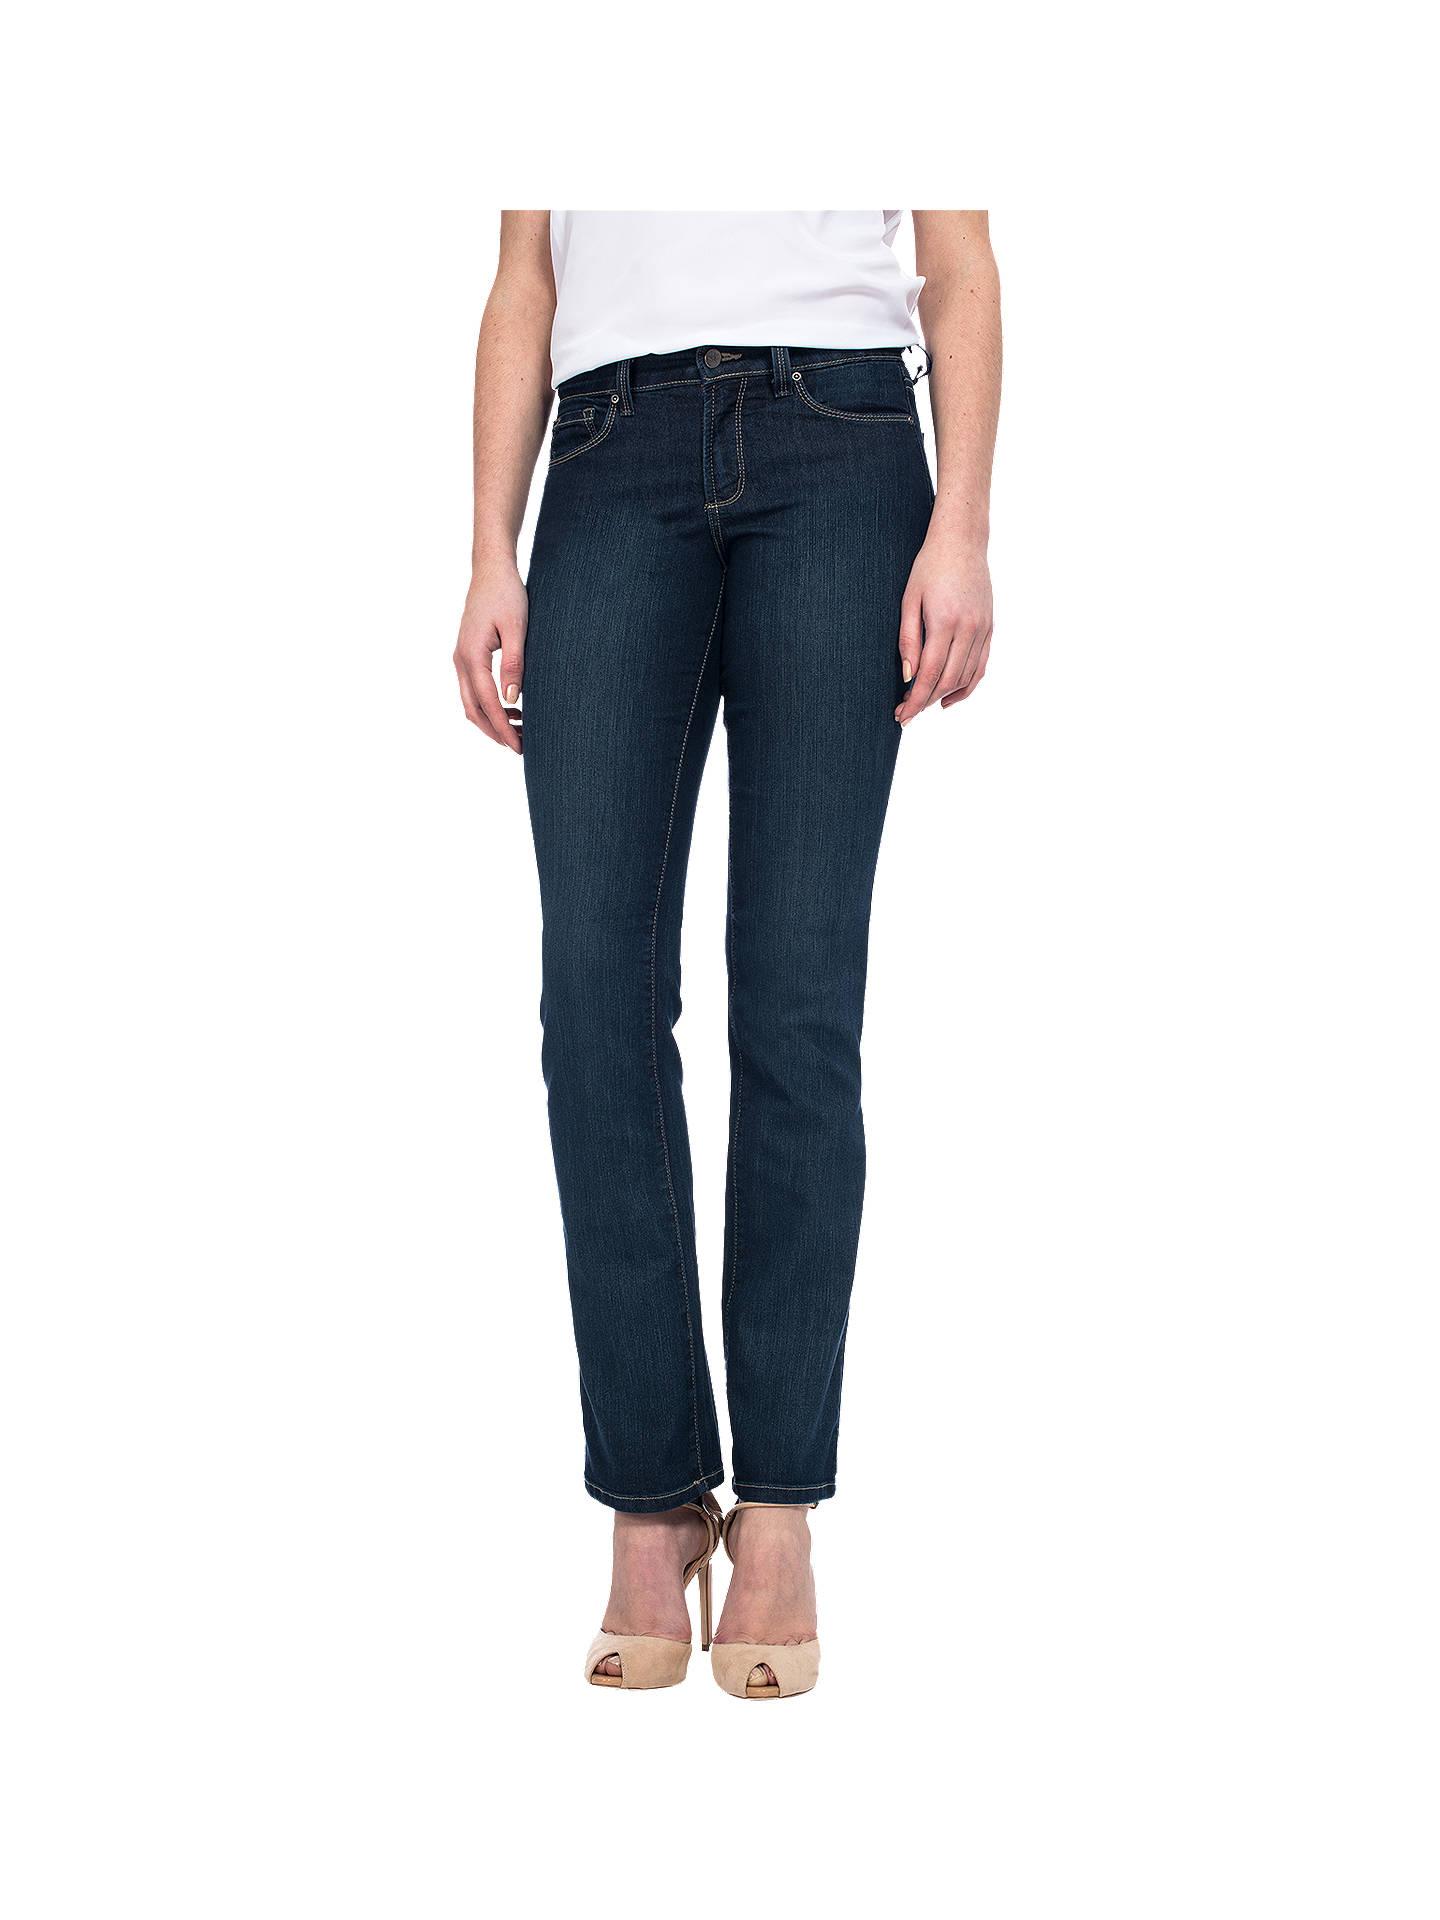 97a1b82086f Buy NYDJ Marilyn Straight Leg Jeans, Indigo, 6S Online at johnlewis.com ...